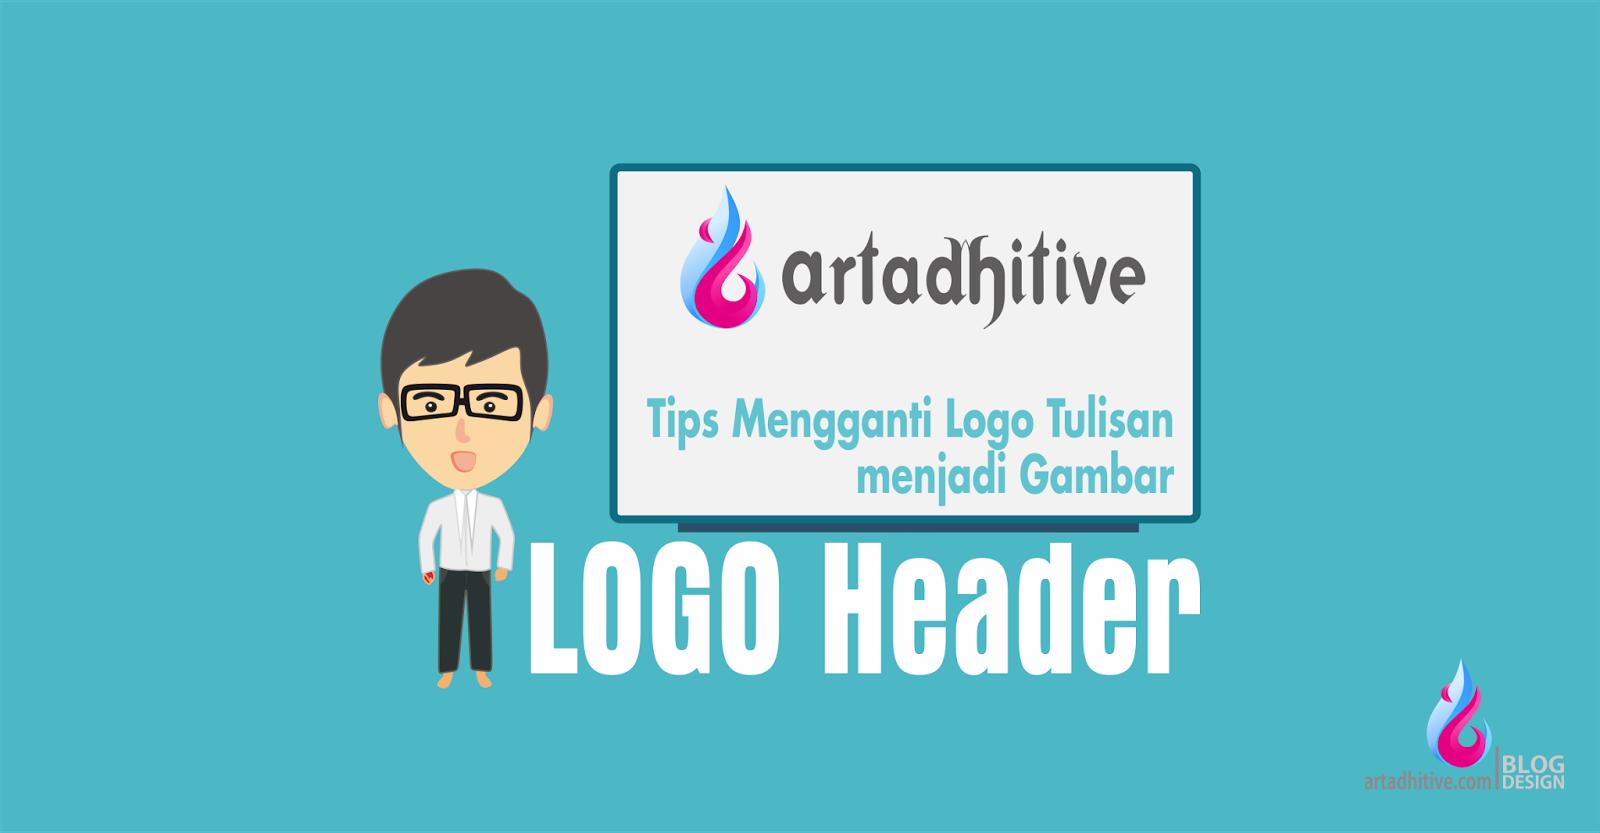 Logo Tulisan berubah menjadi Gambar